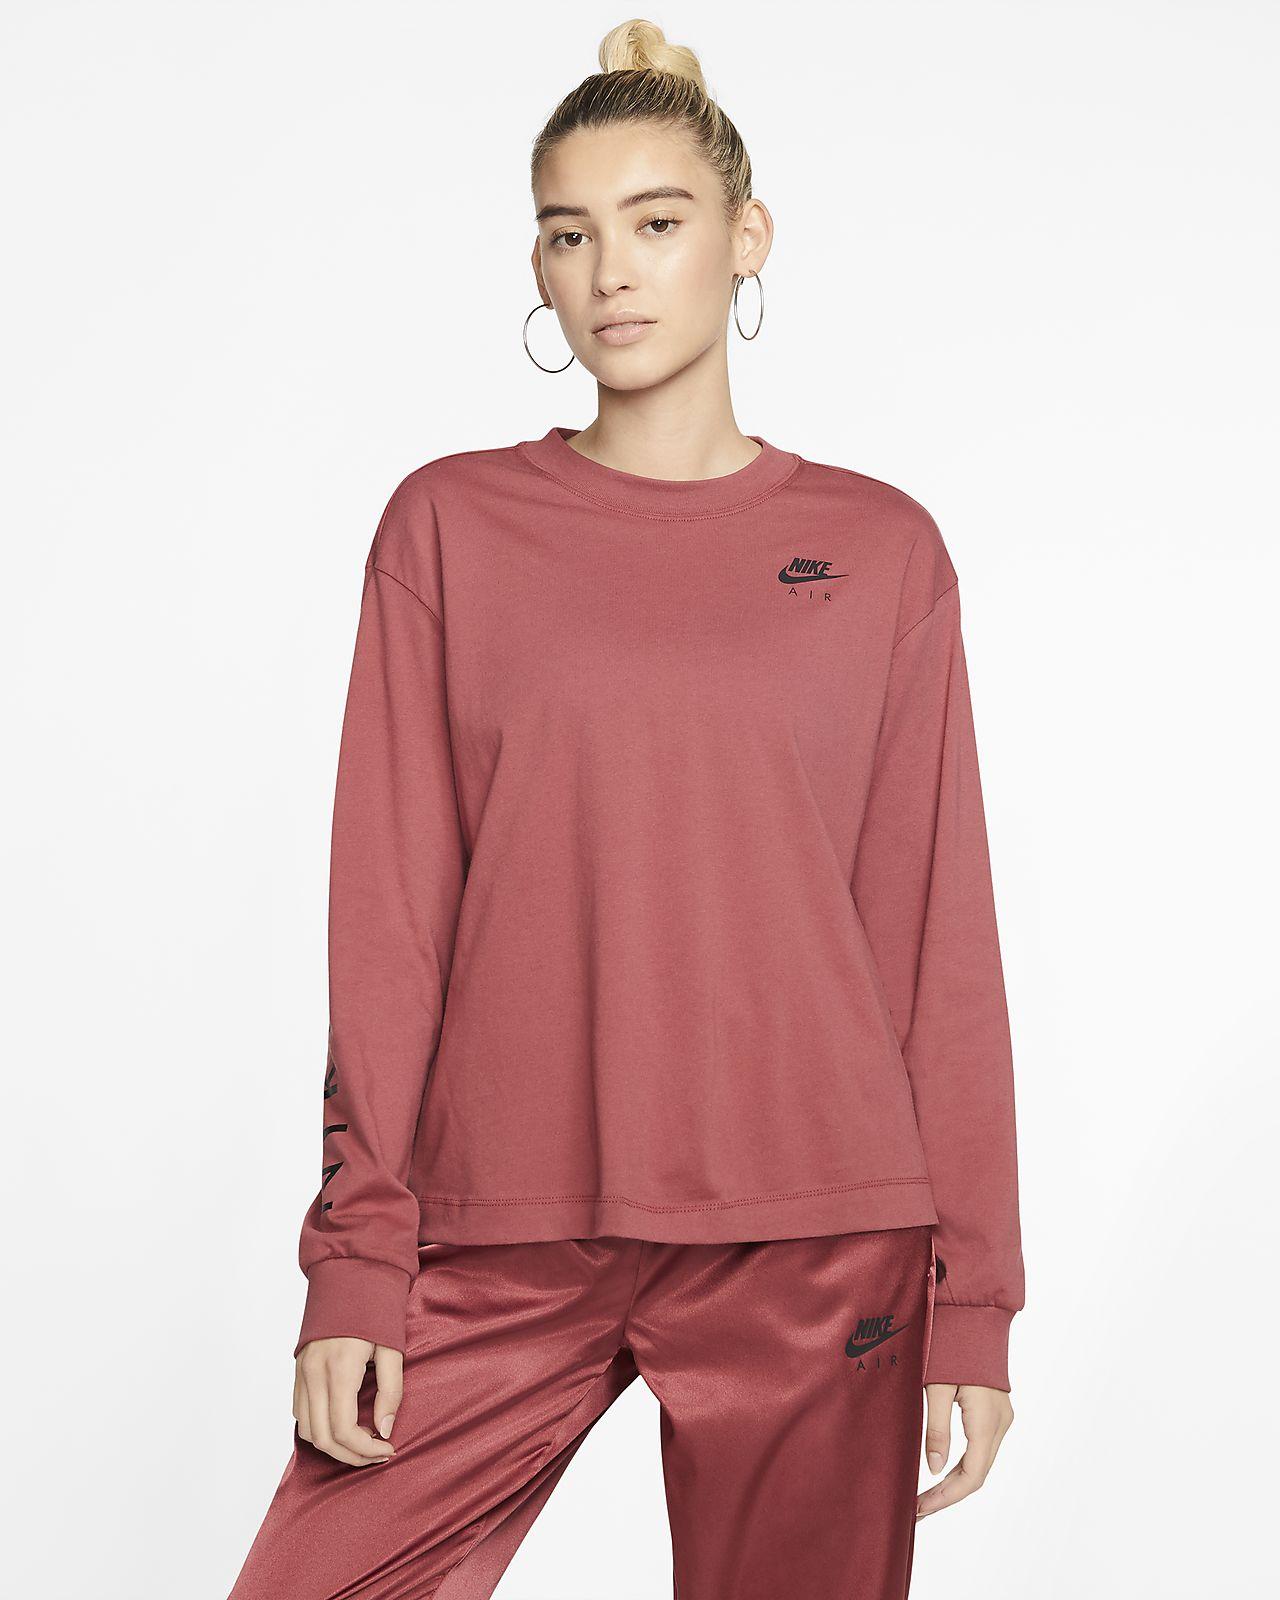 Air Camiseta de manga larga